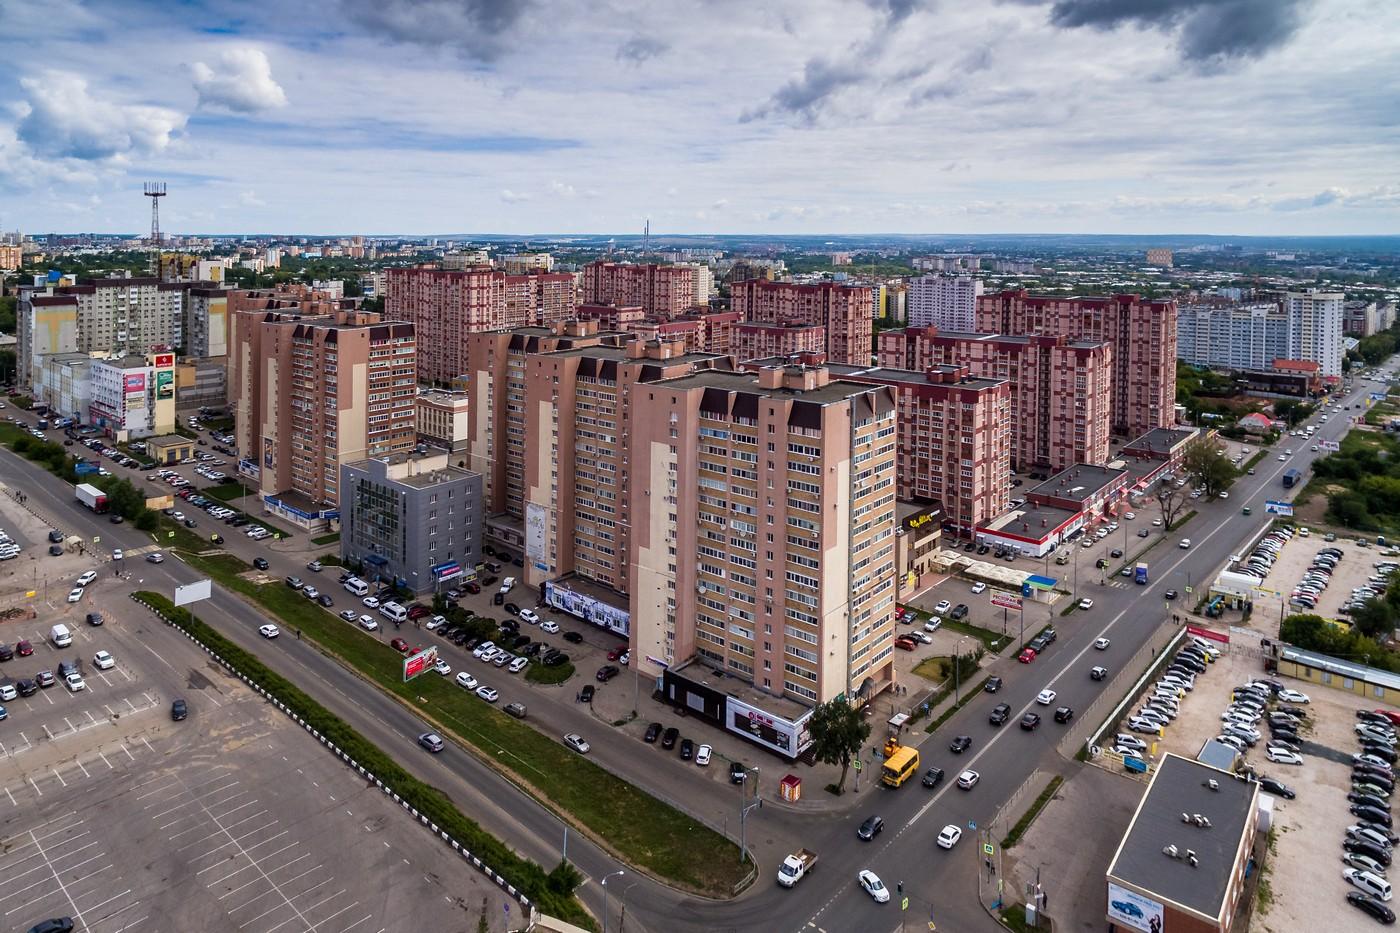 Самара с высоты, лето 2018. Часть 1(Пасмурная). город как на ладони